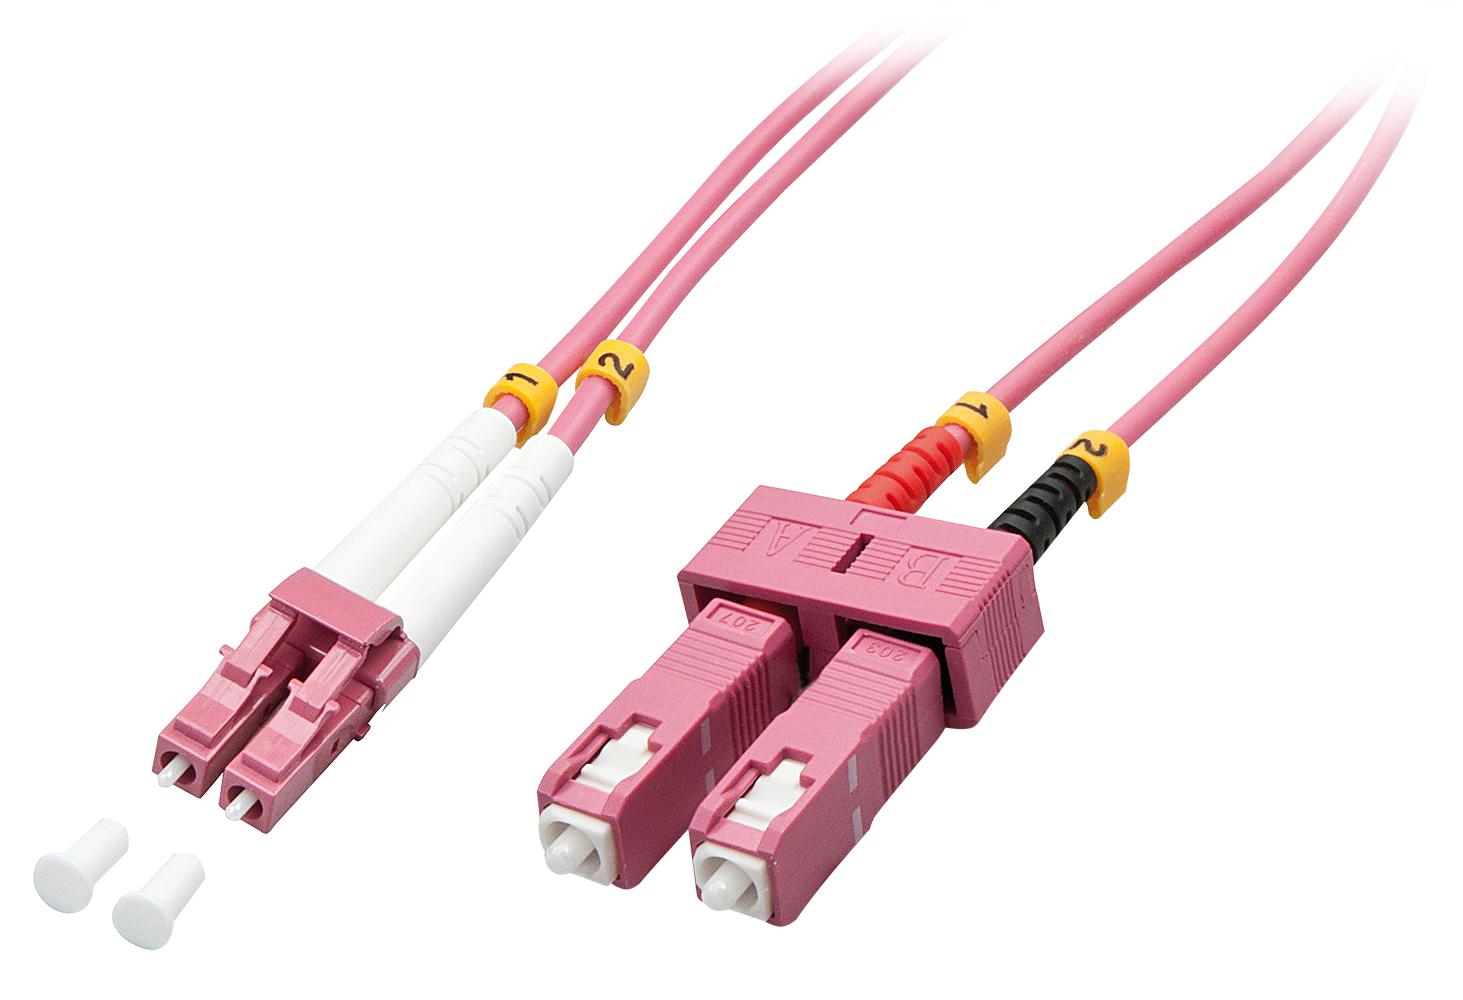 Lindy Patch-Kabel - LC Multi-Mode (M) - SC multi-mode (M)